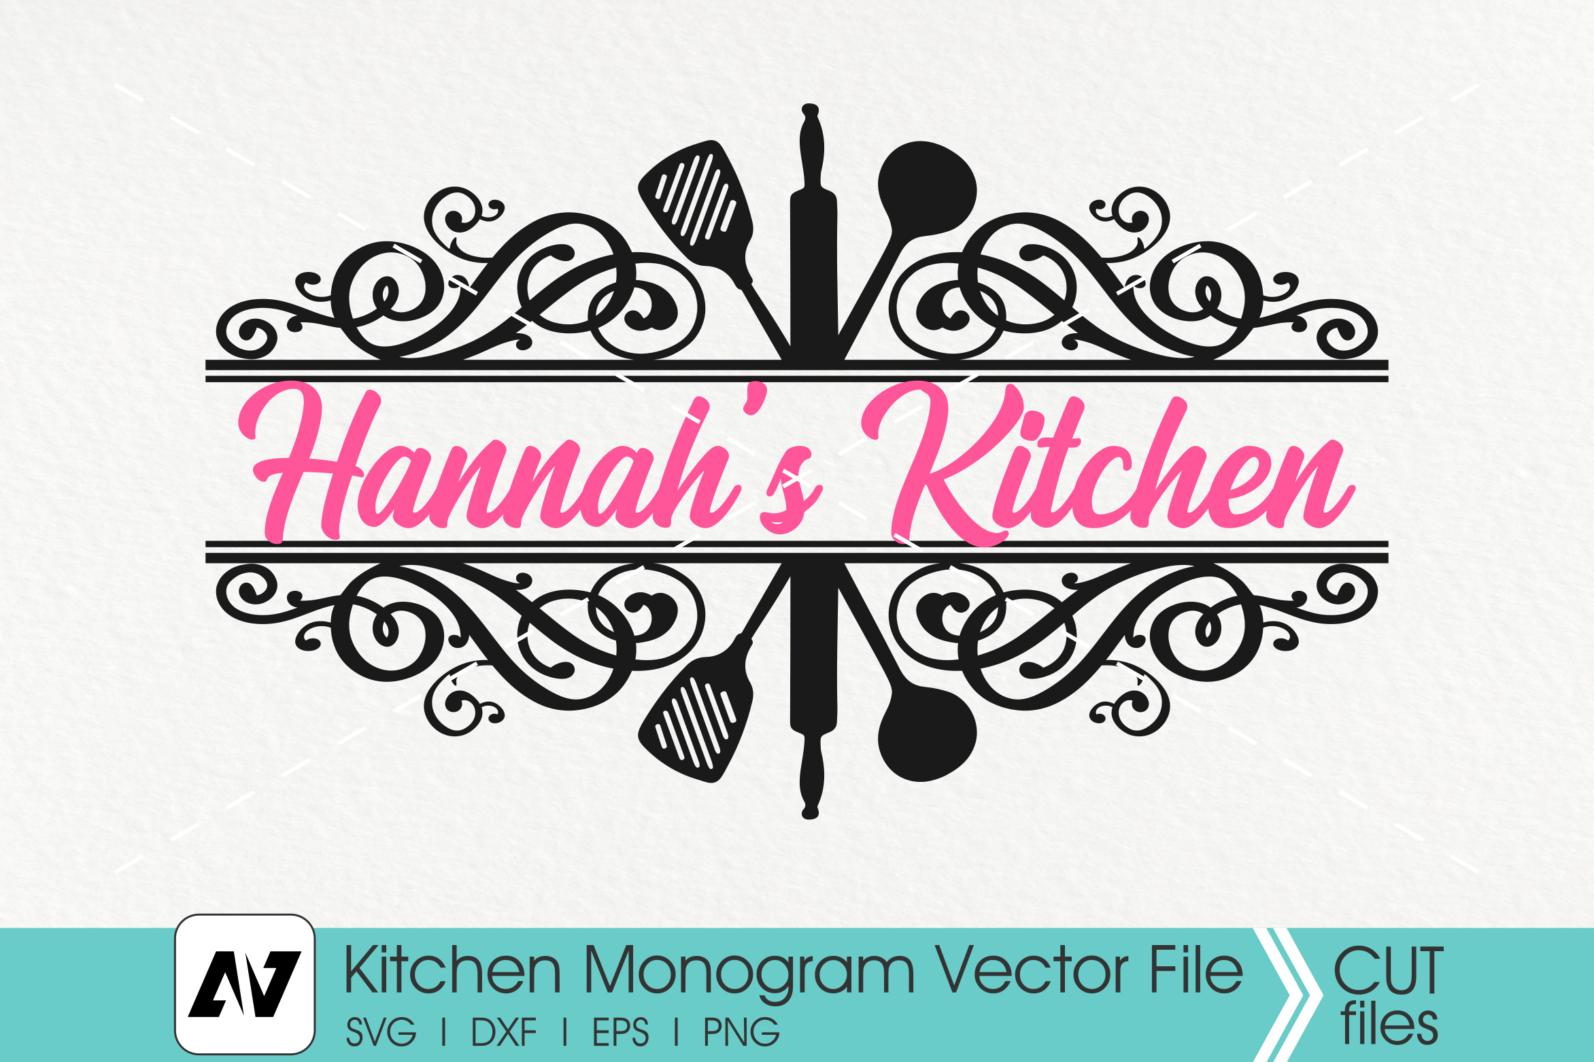 Kitchen Svg, Kitchen Monogram Svg, Kitchen Utensils Svg - ETSY POST -